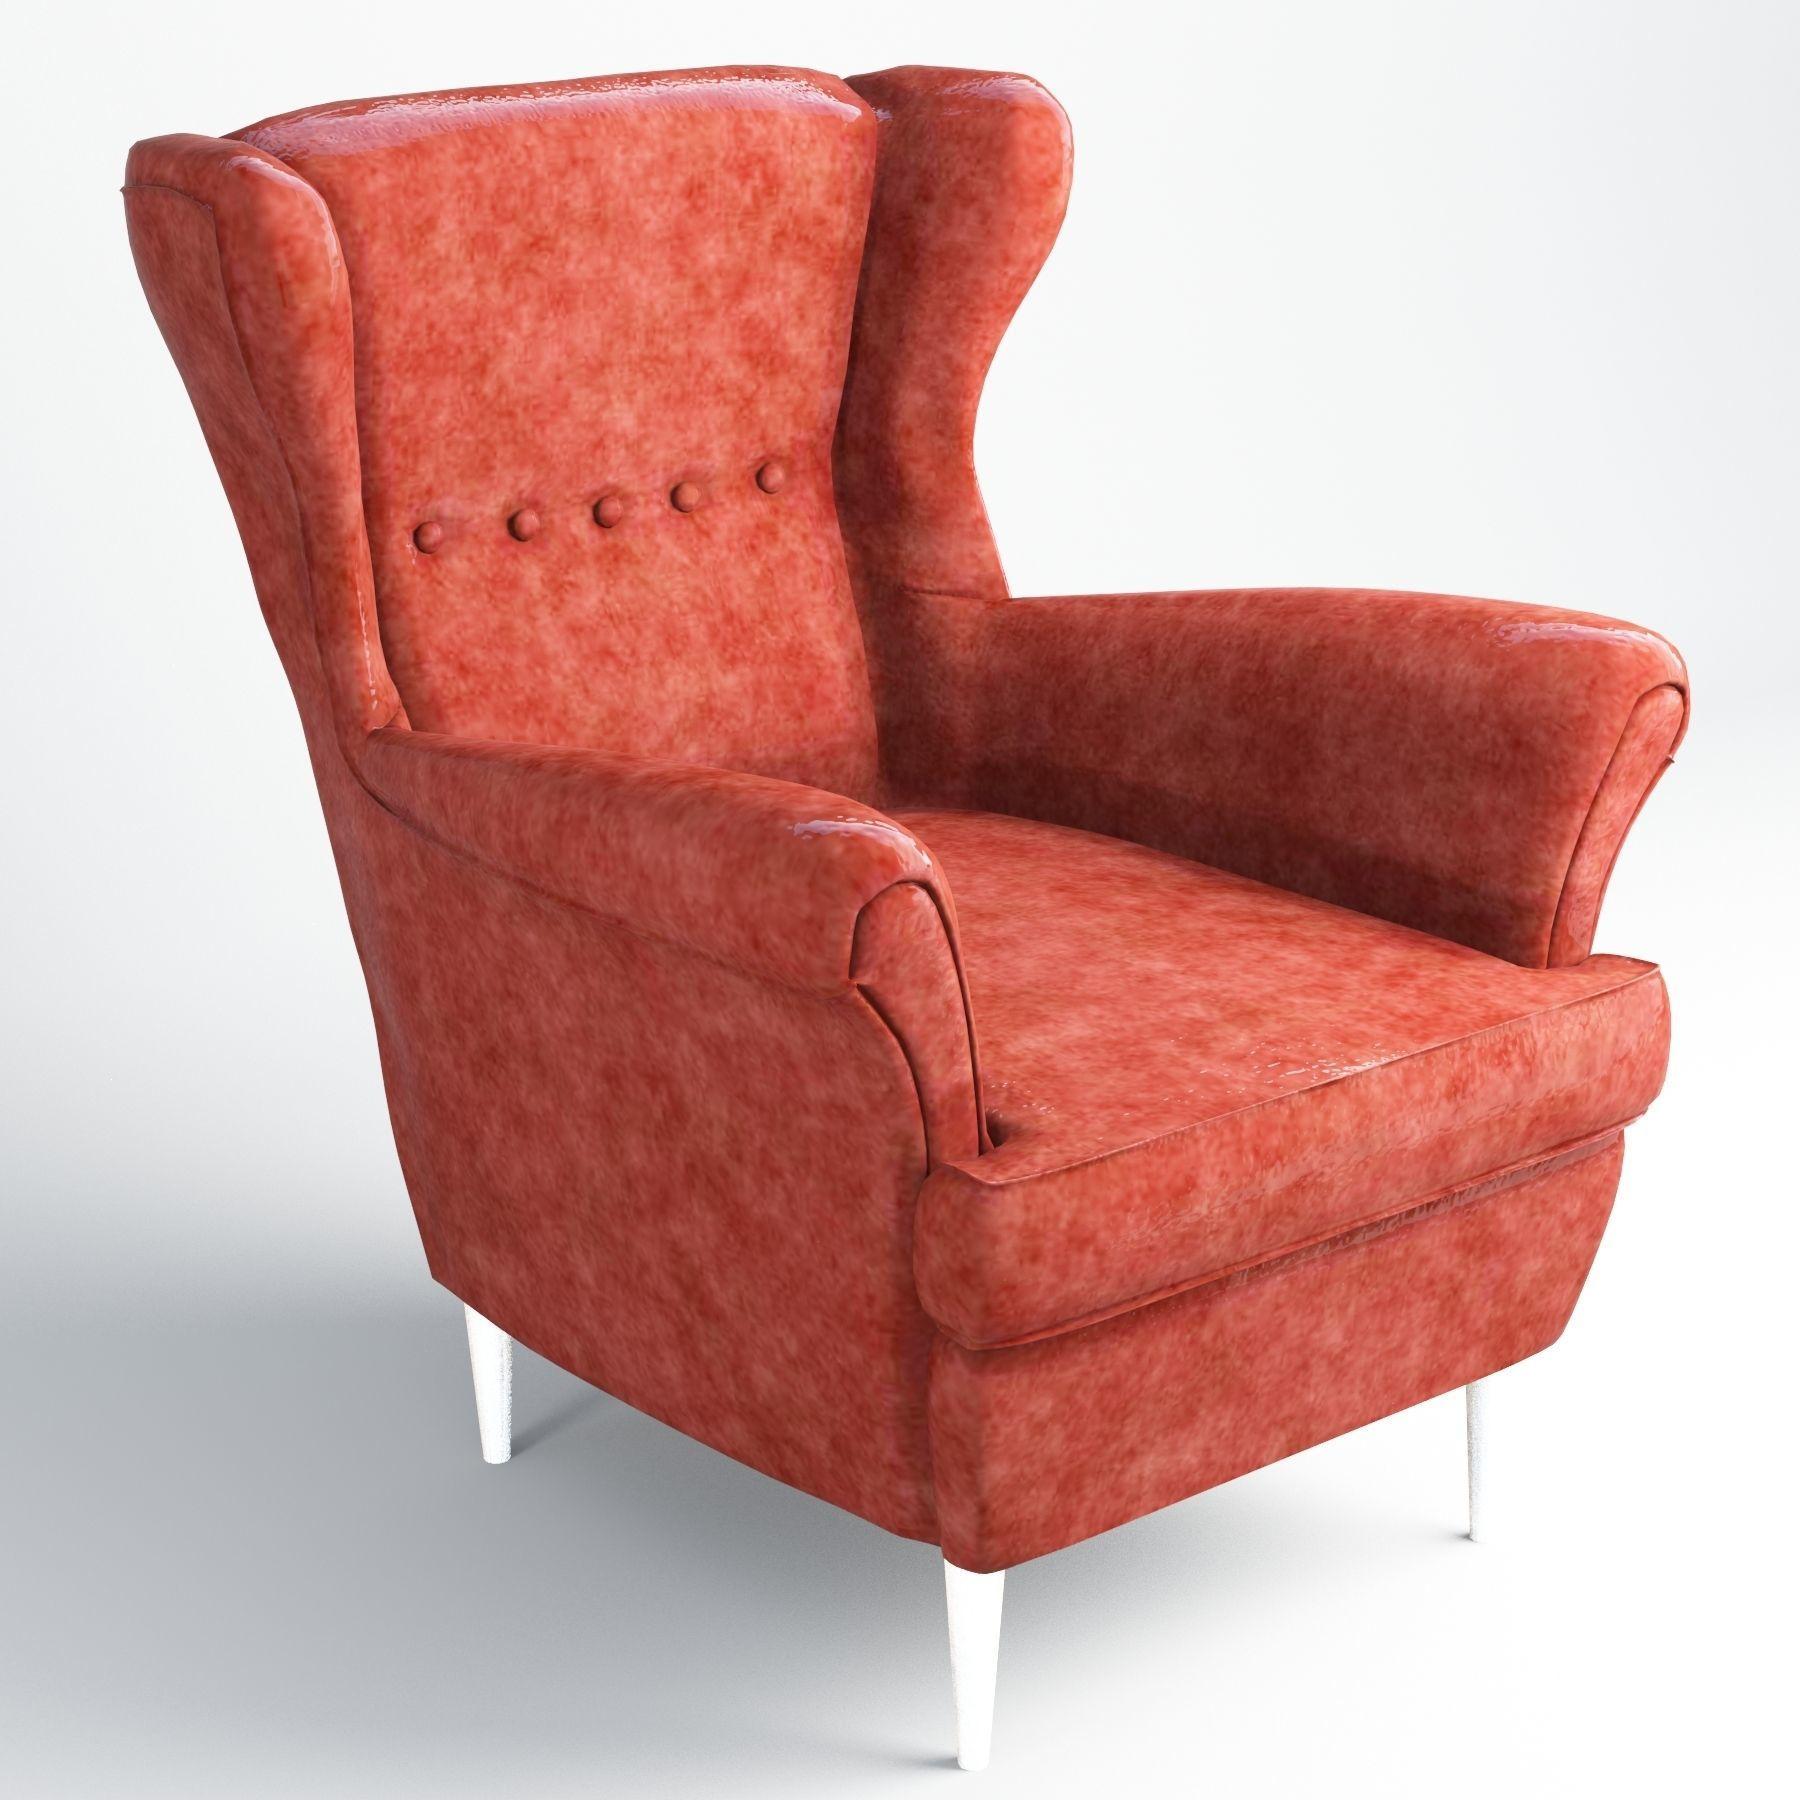 3d Asset Vr Ar Ready Strandmon Sofa Ikea Cgtrader